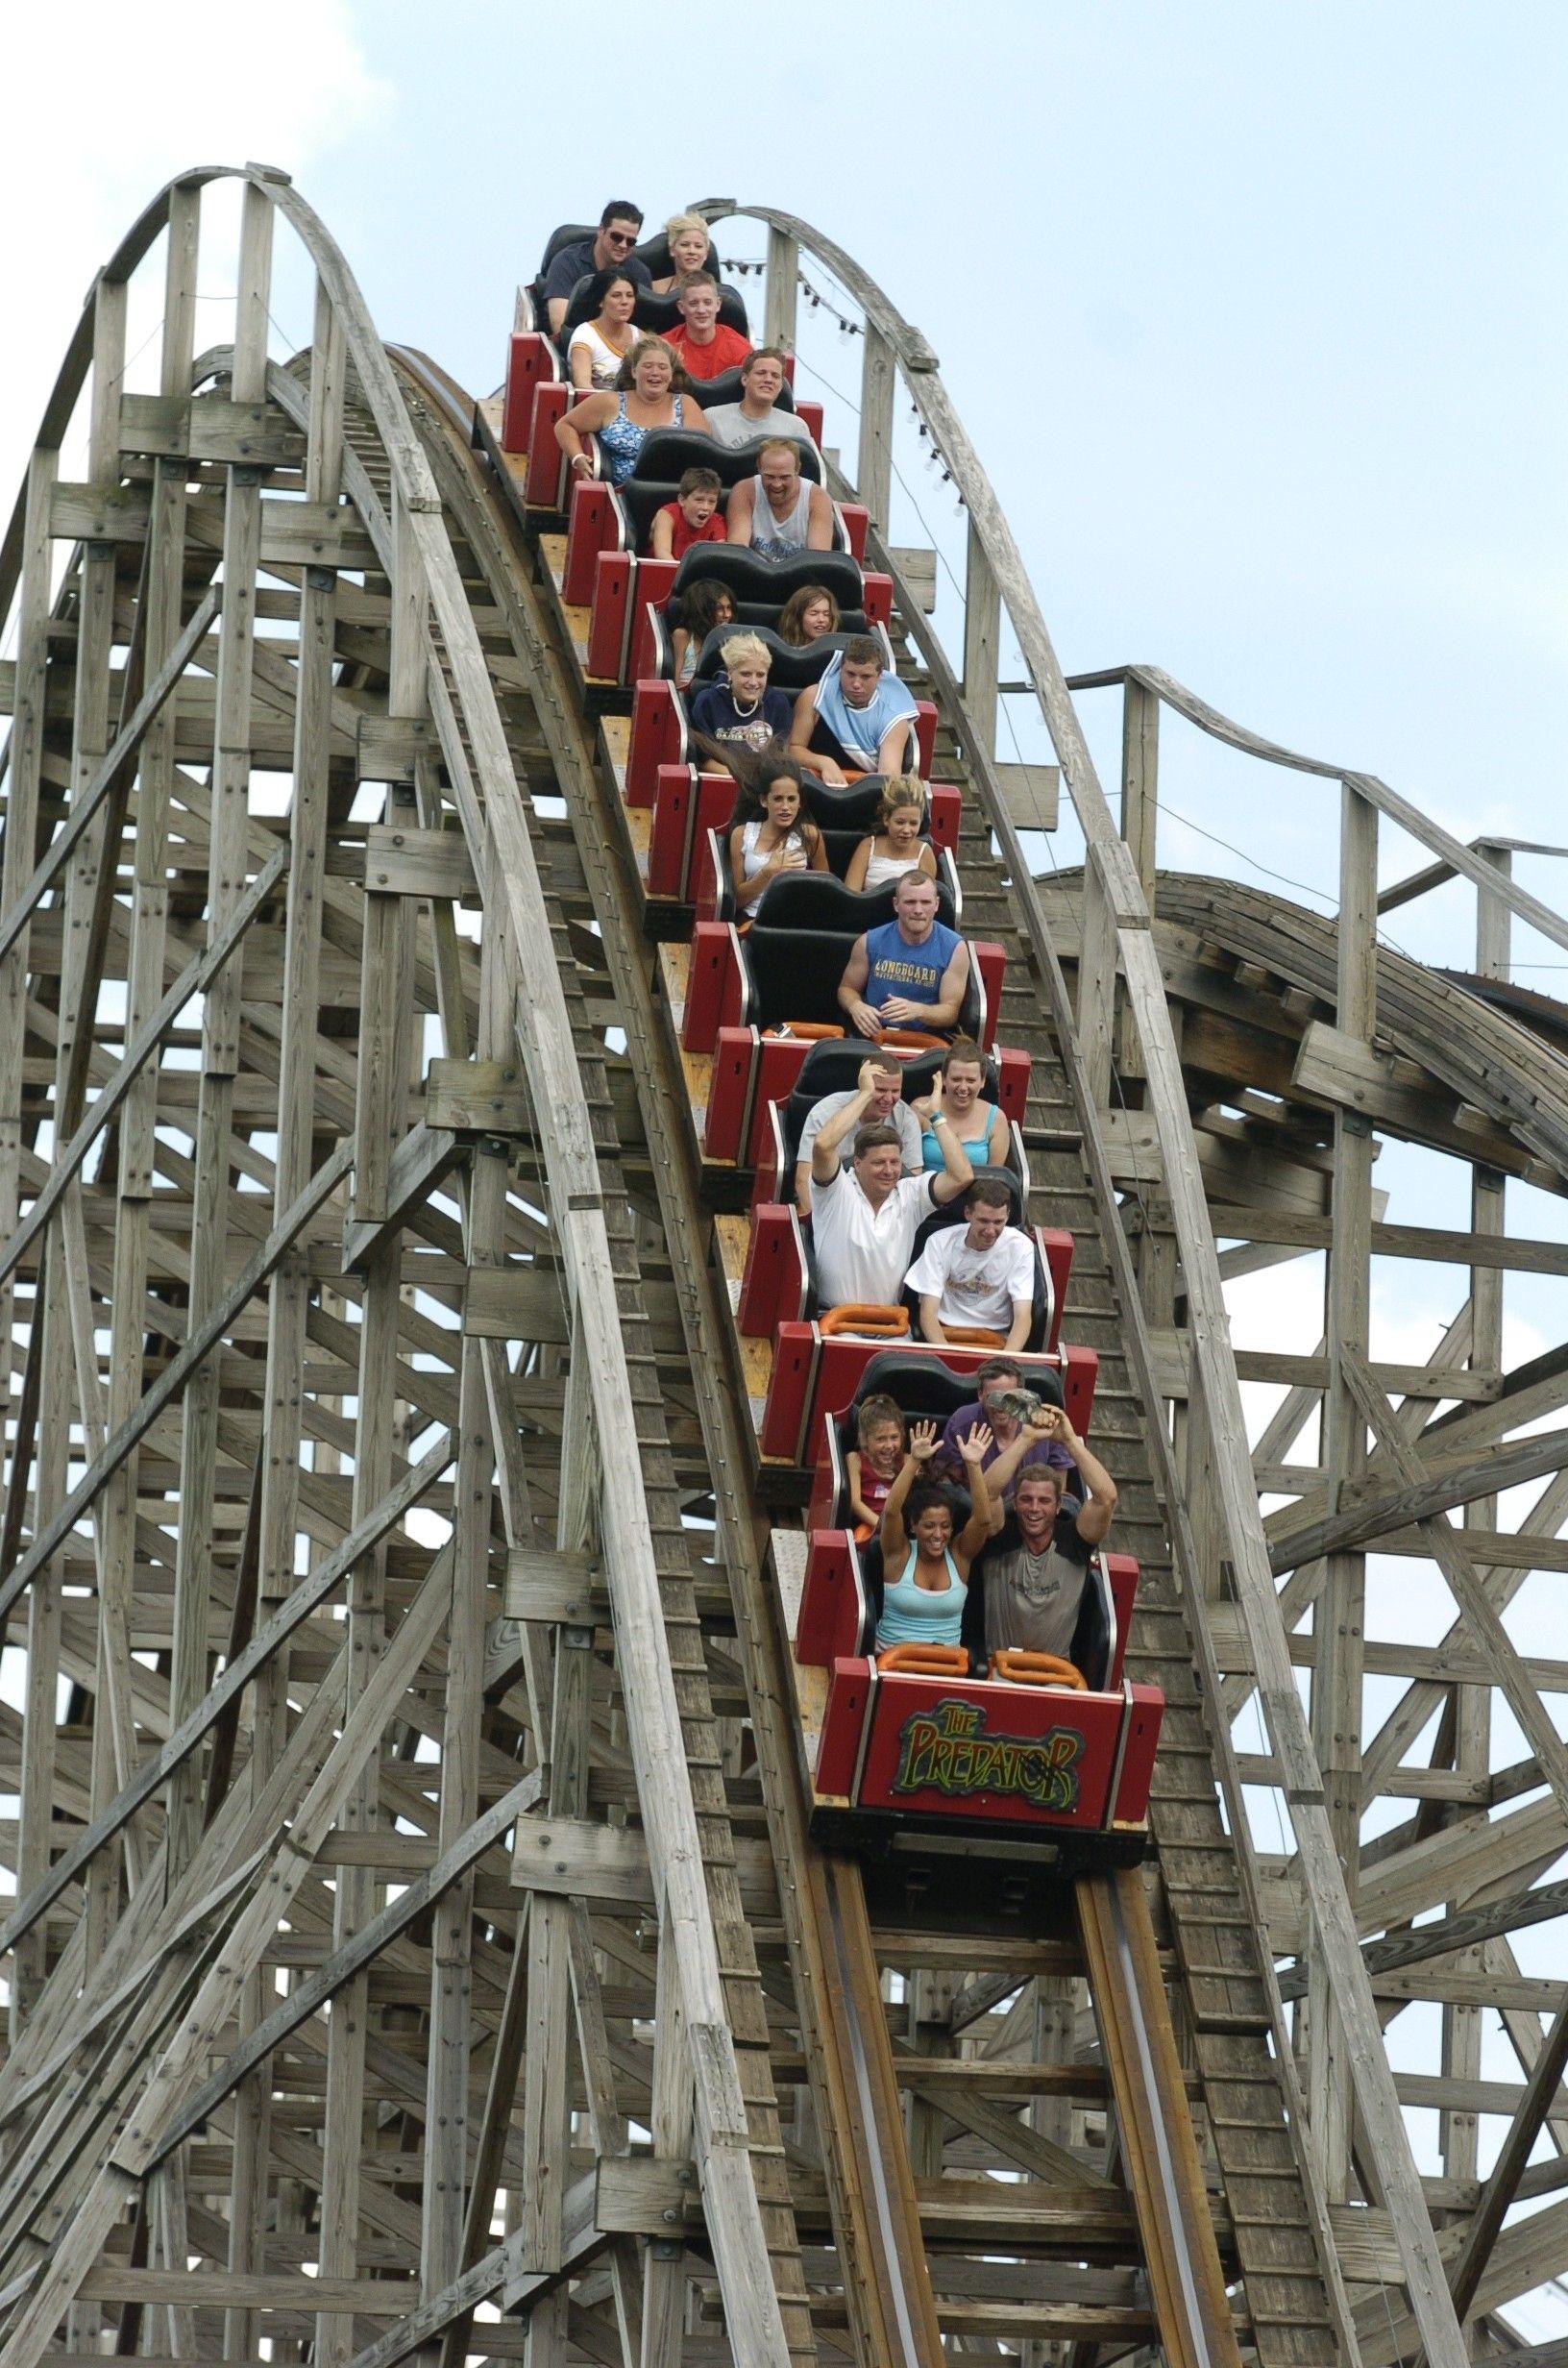 Darien Lake Amusement Park Home Darien Lake Amusement Park Rides Roller Coaster